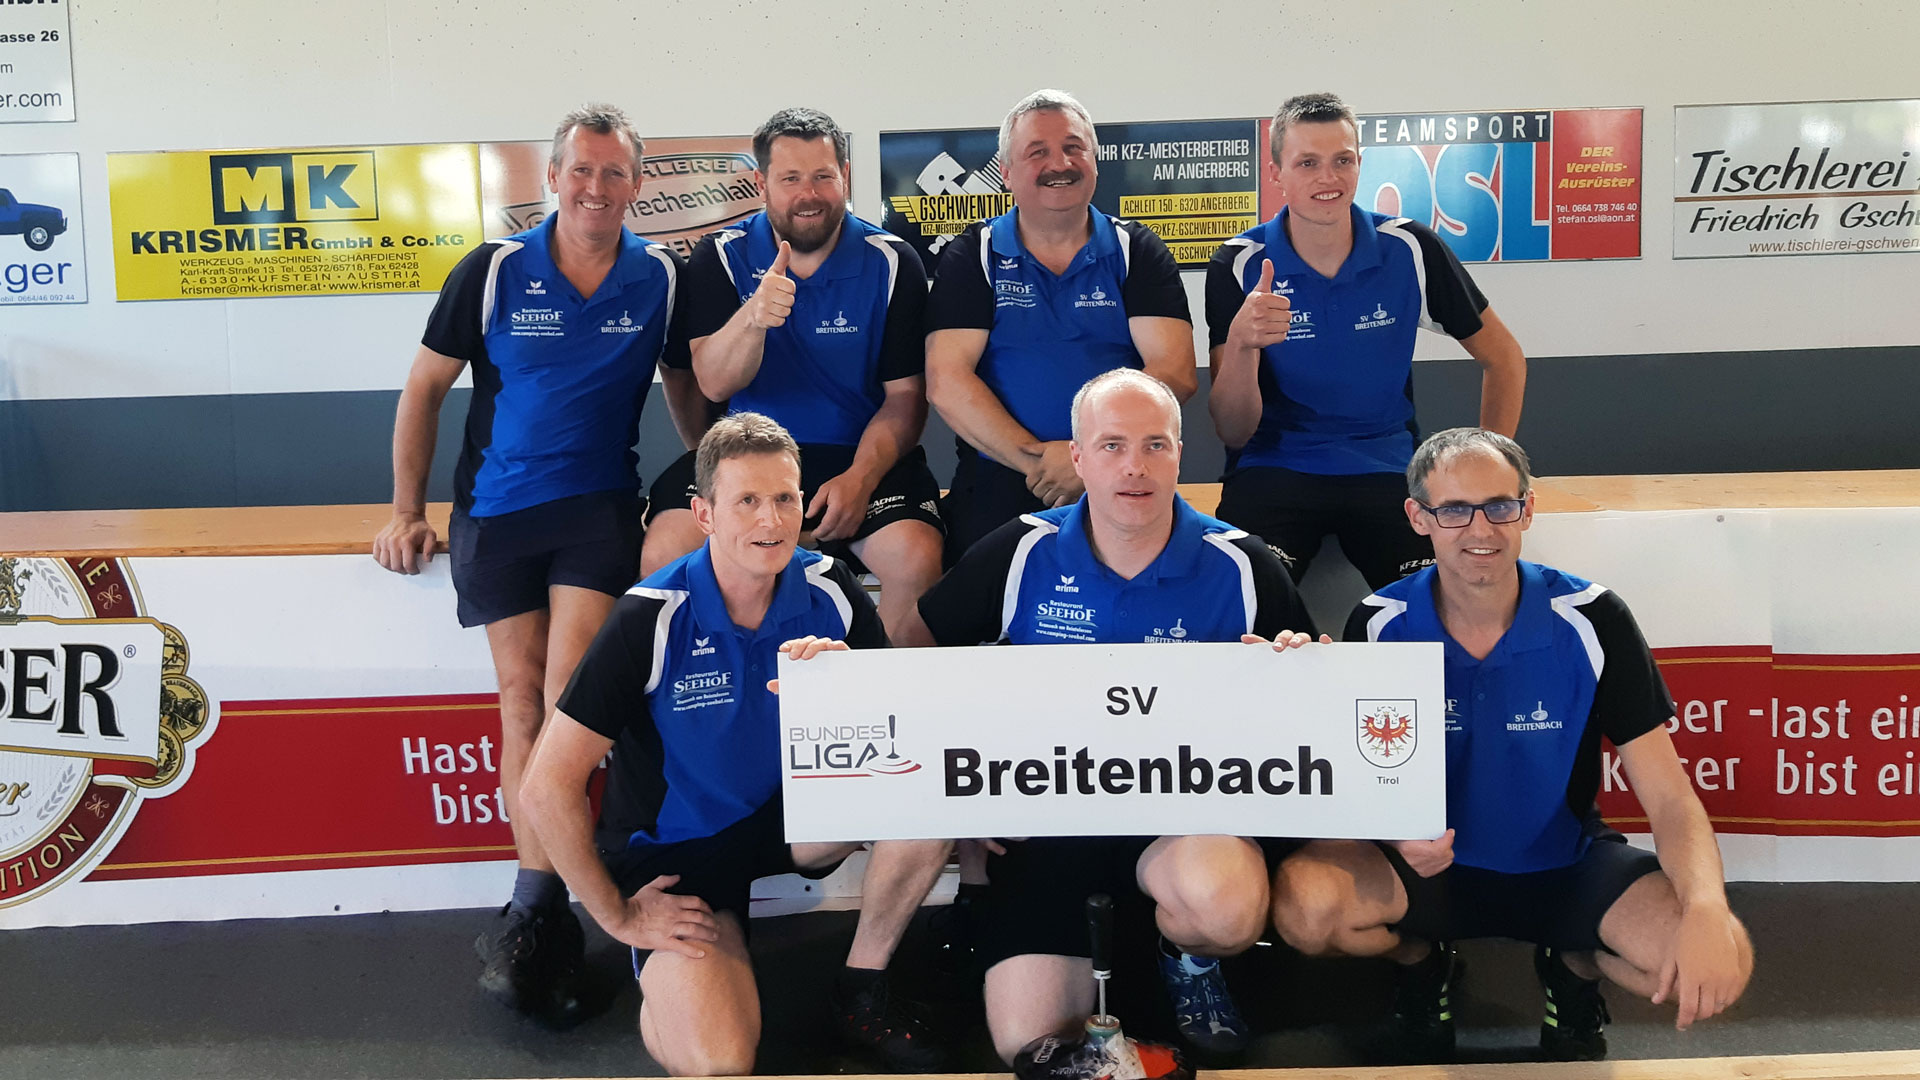 Starke Bundesliga 1 Saison des SV Breitenbach